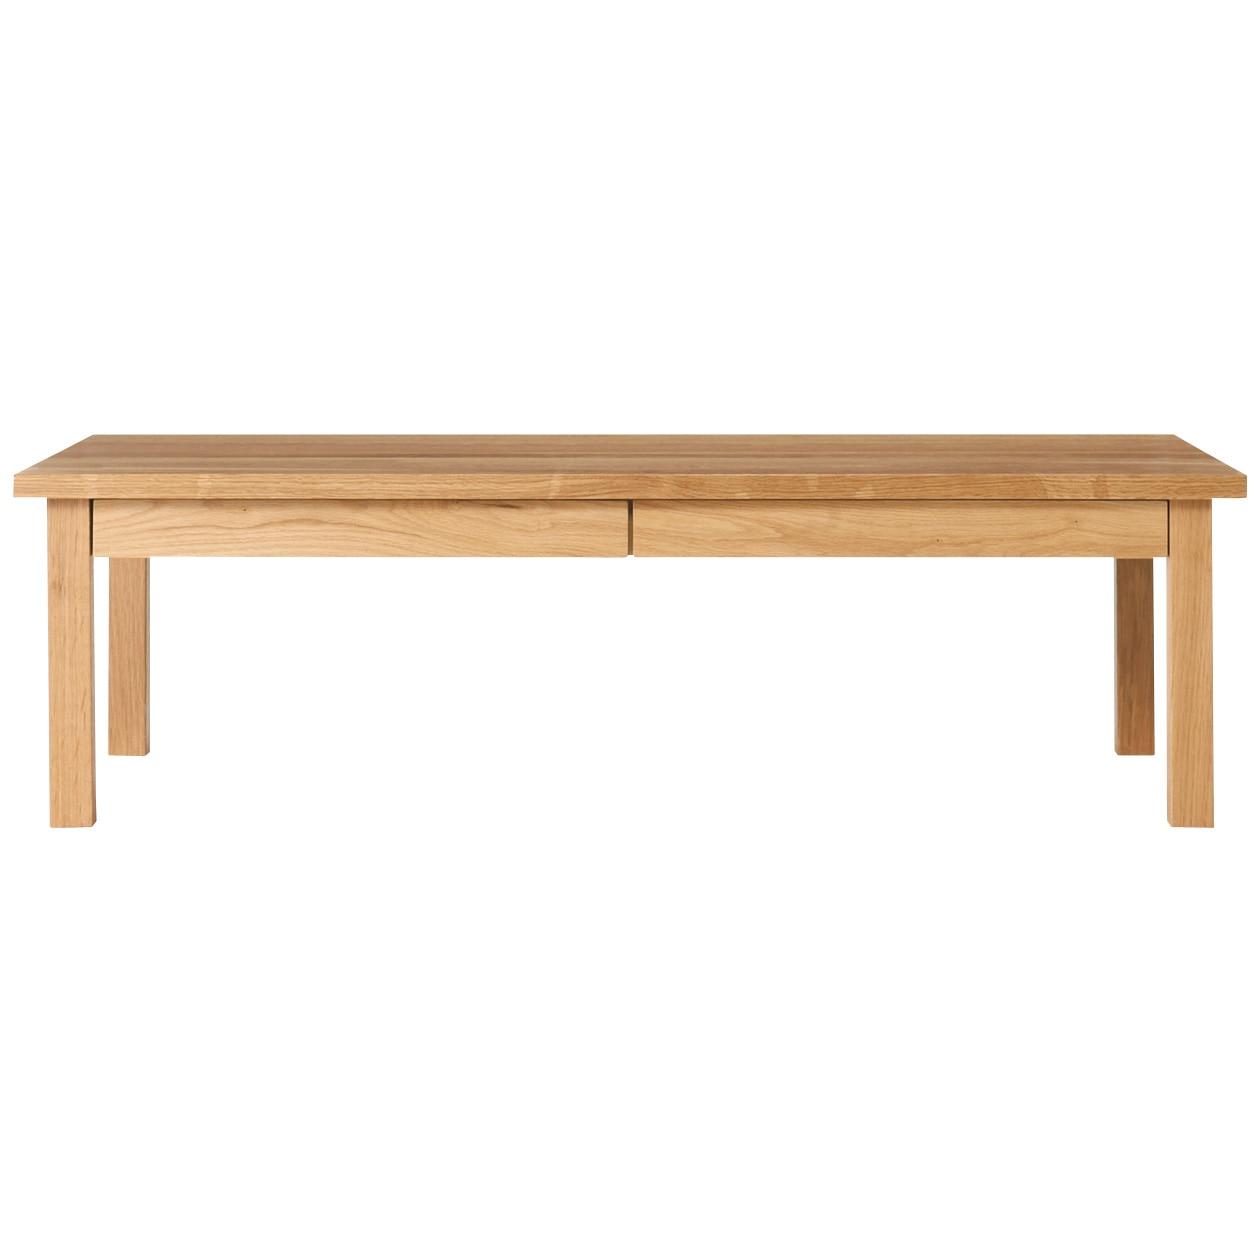 RoomClip商品情報 - 無垢材ローテーブル・オーク材・120×60cm